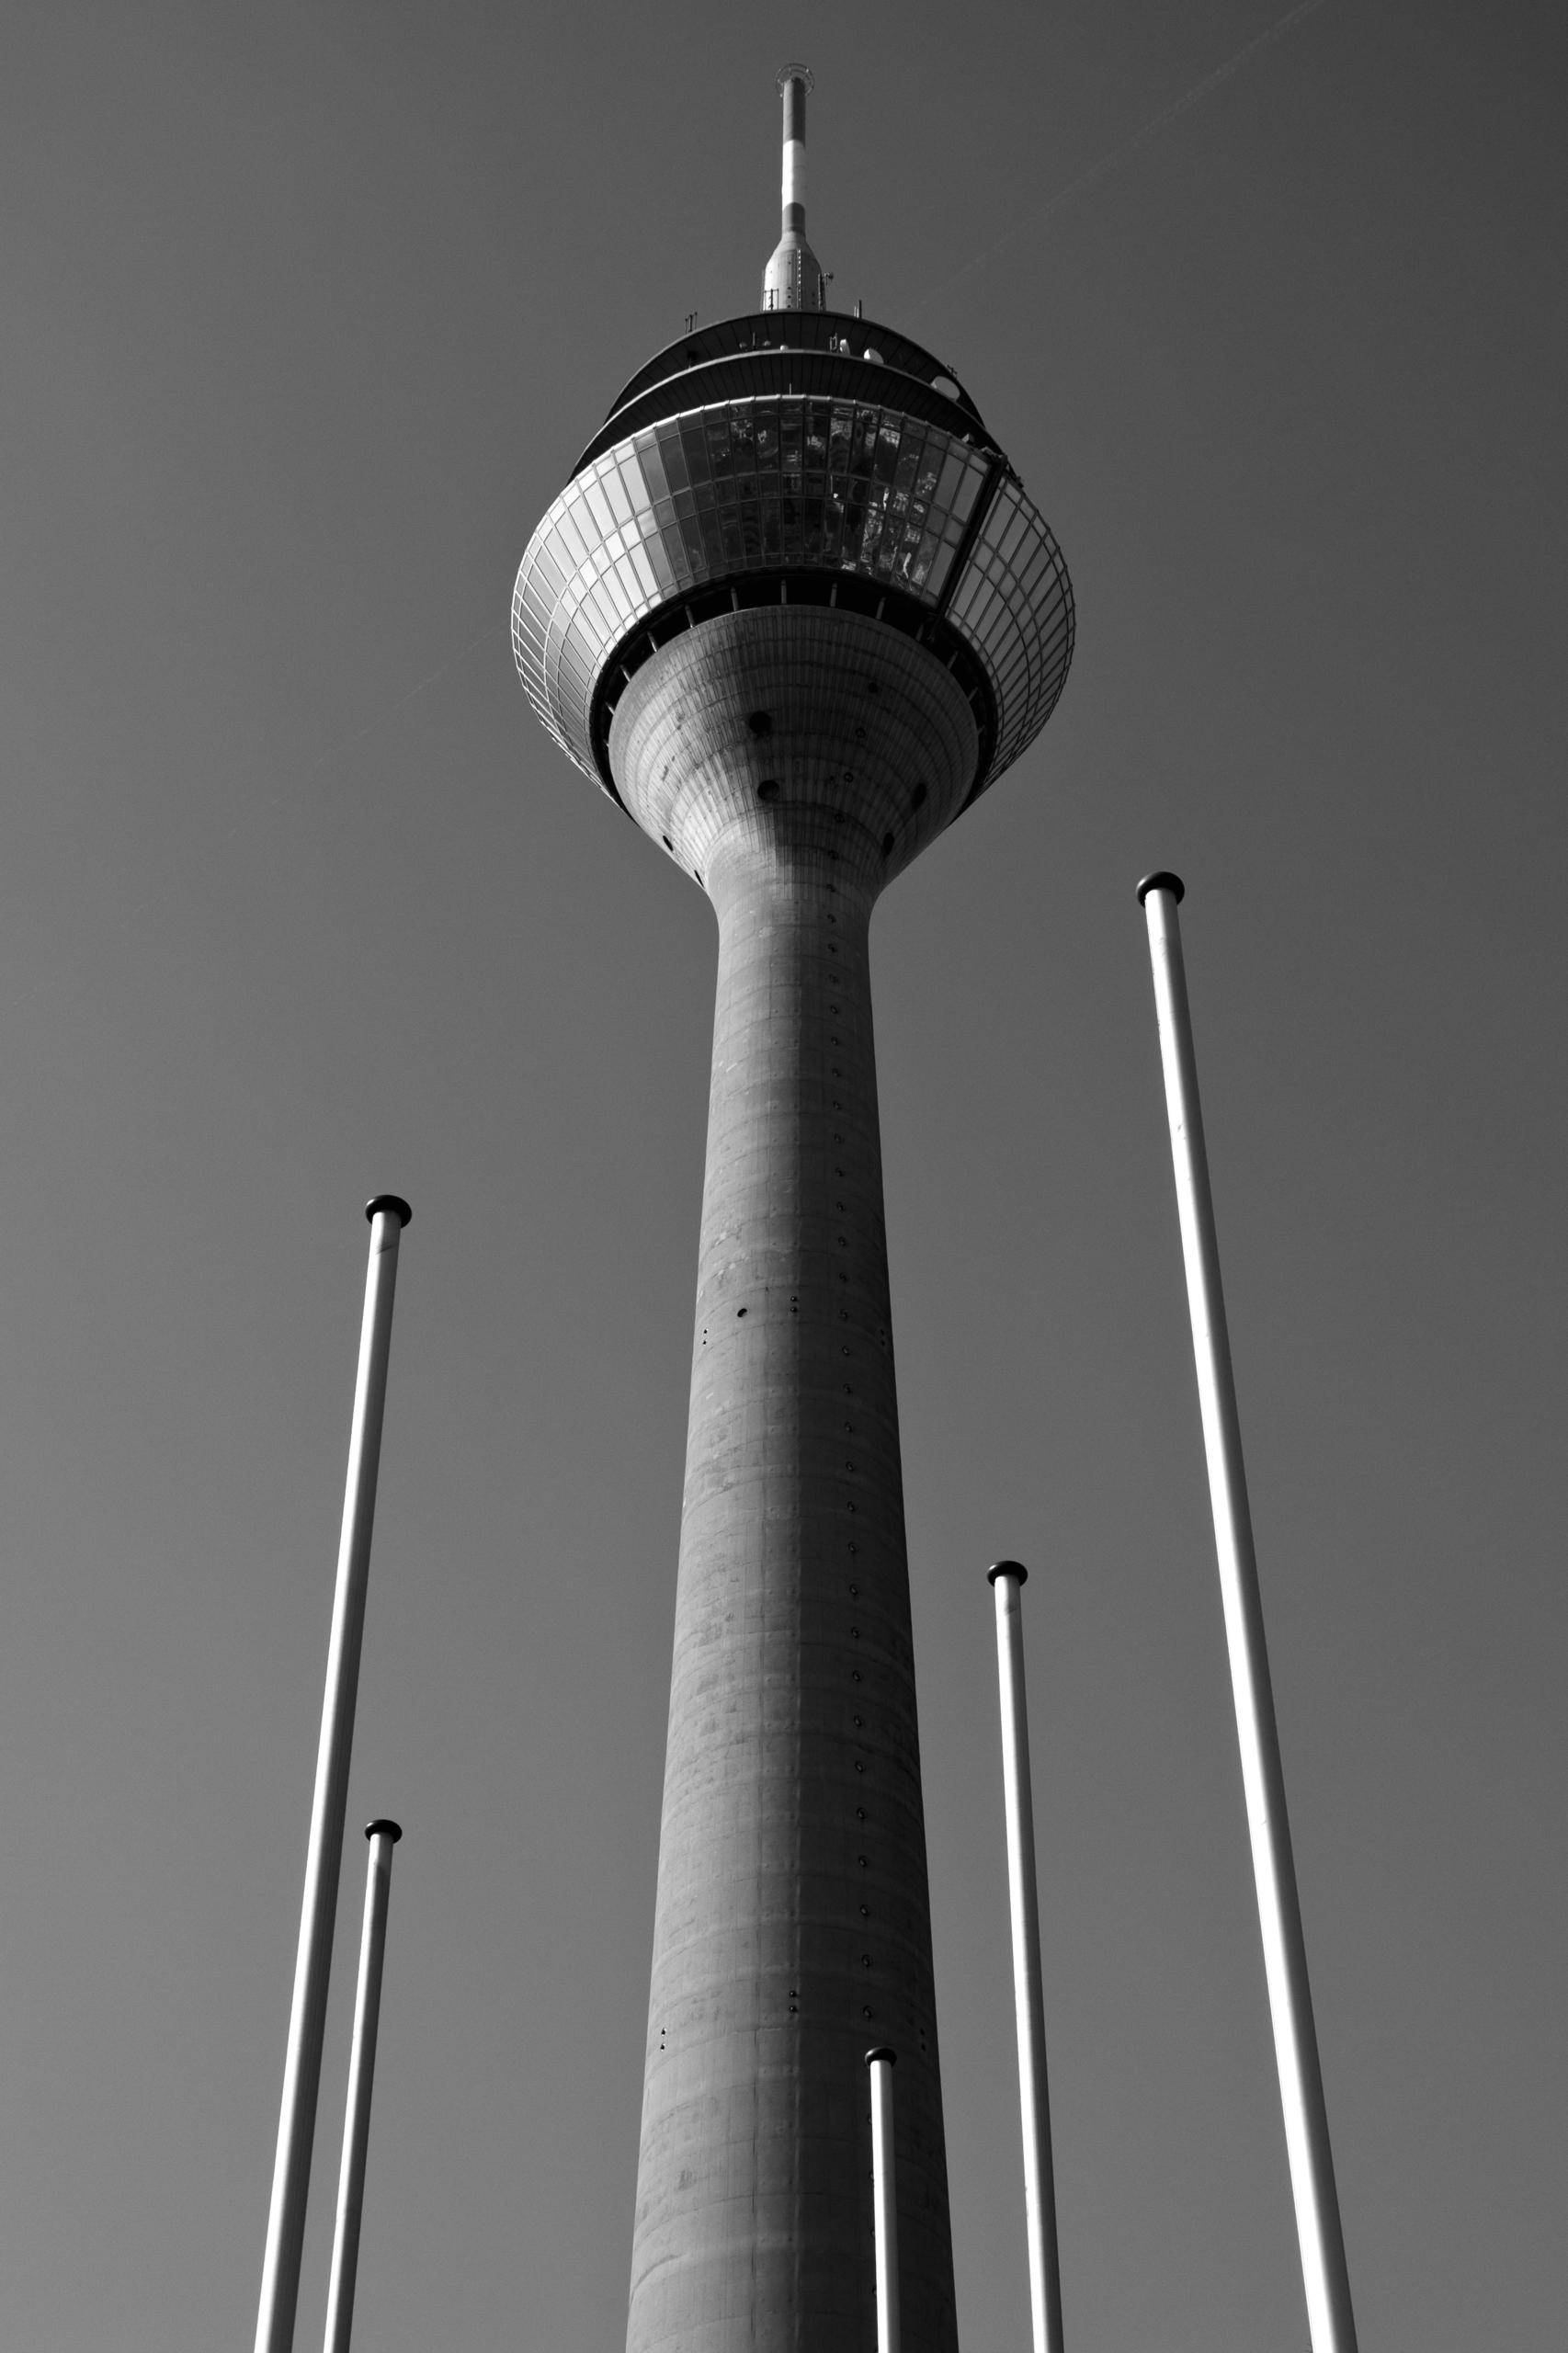 Lucas_Hergarten_Düsseldorf_1.jpg